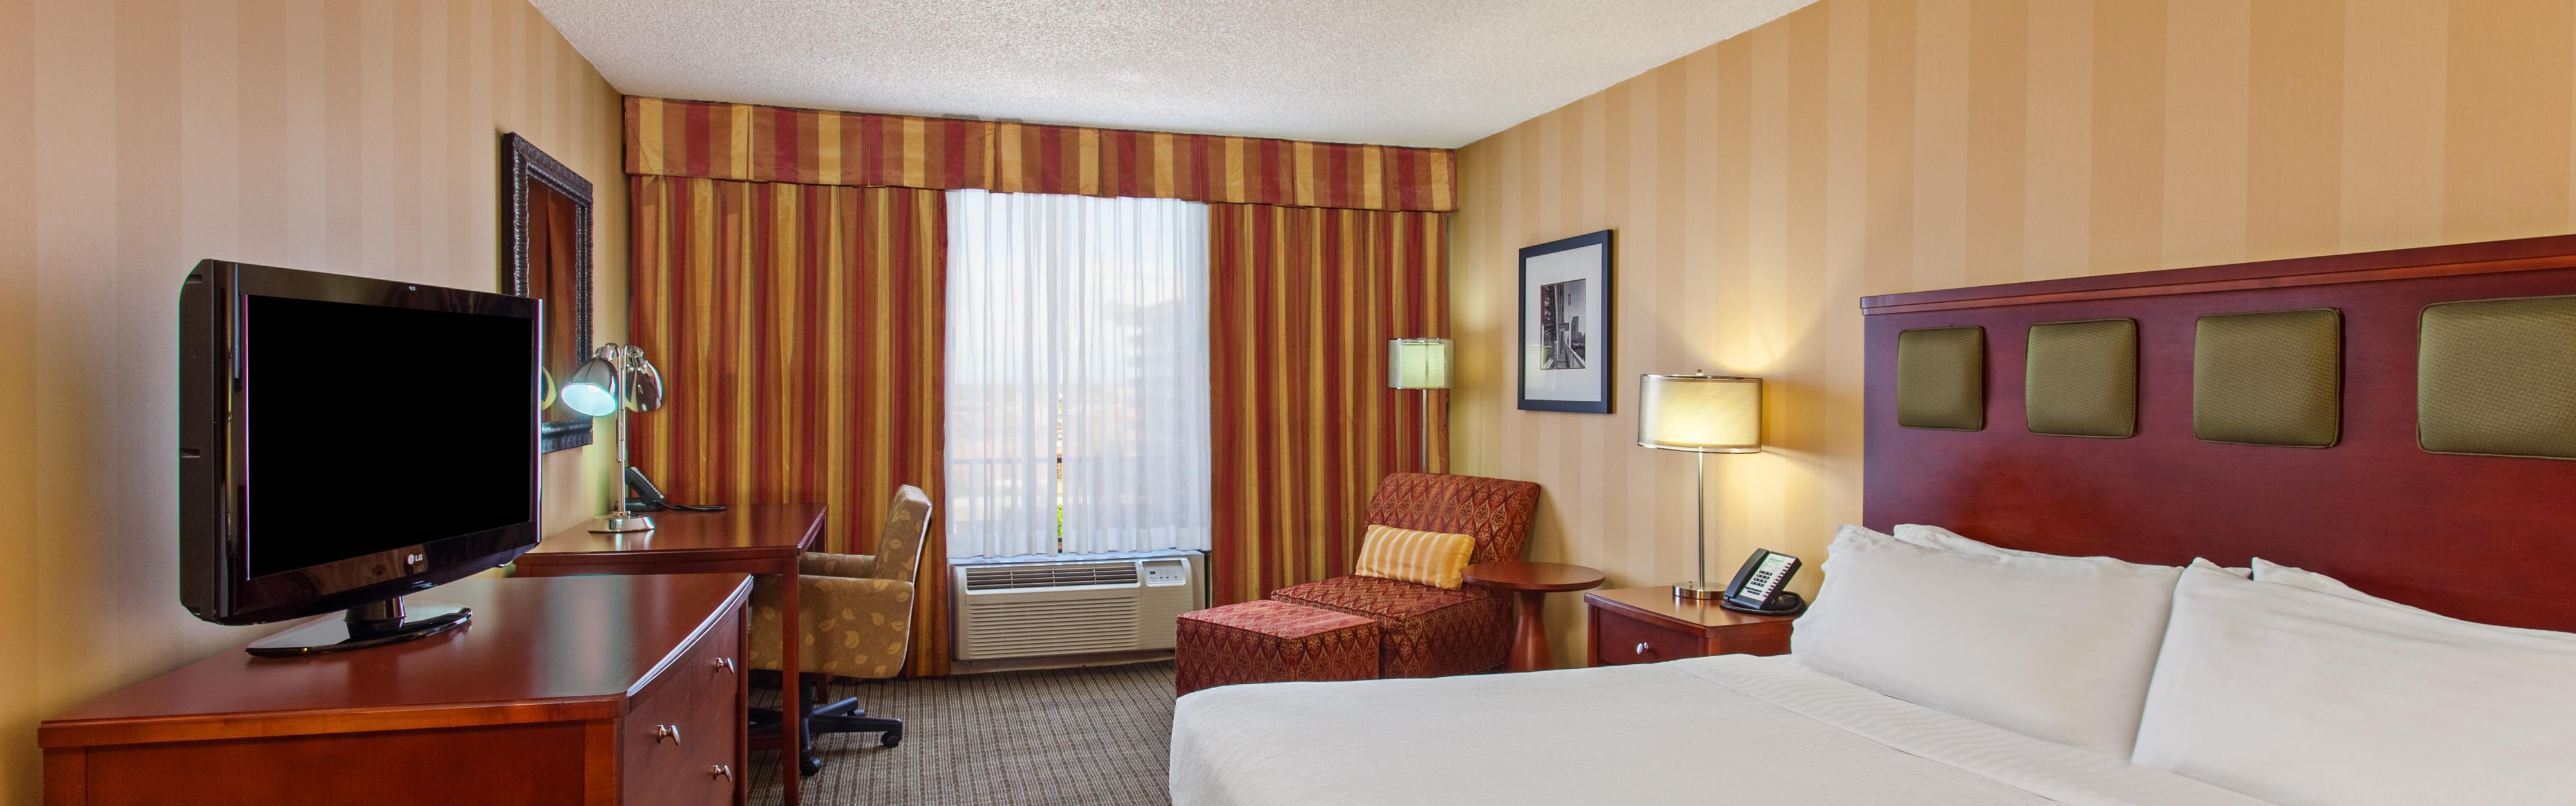 Holiday Inn Sacramento Downtown - Arena image 1